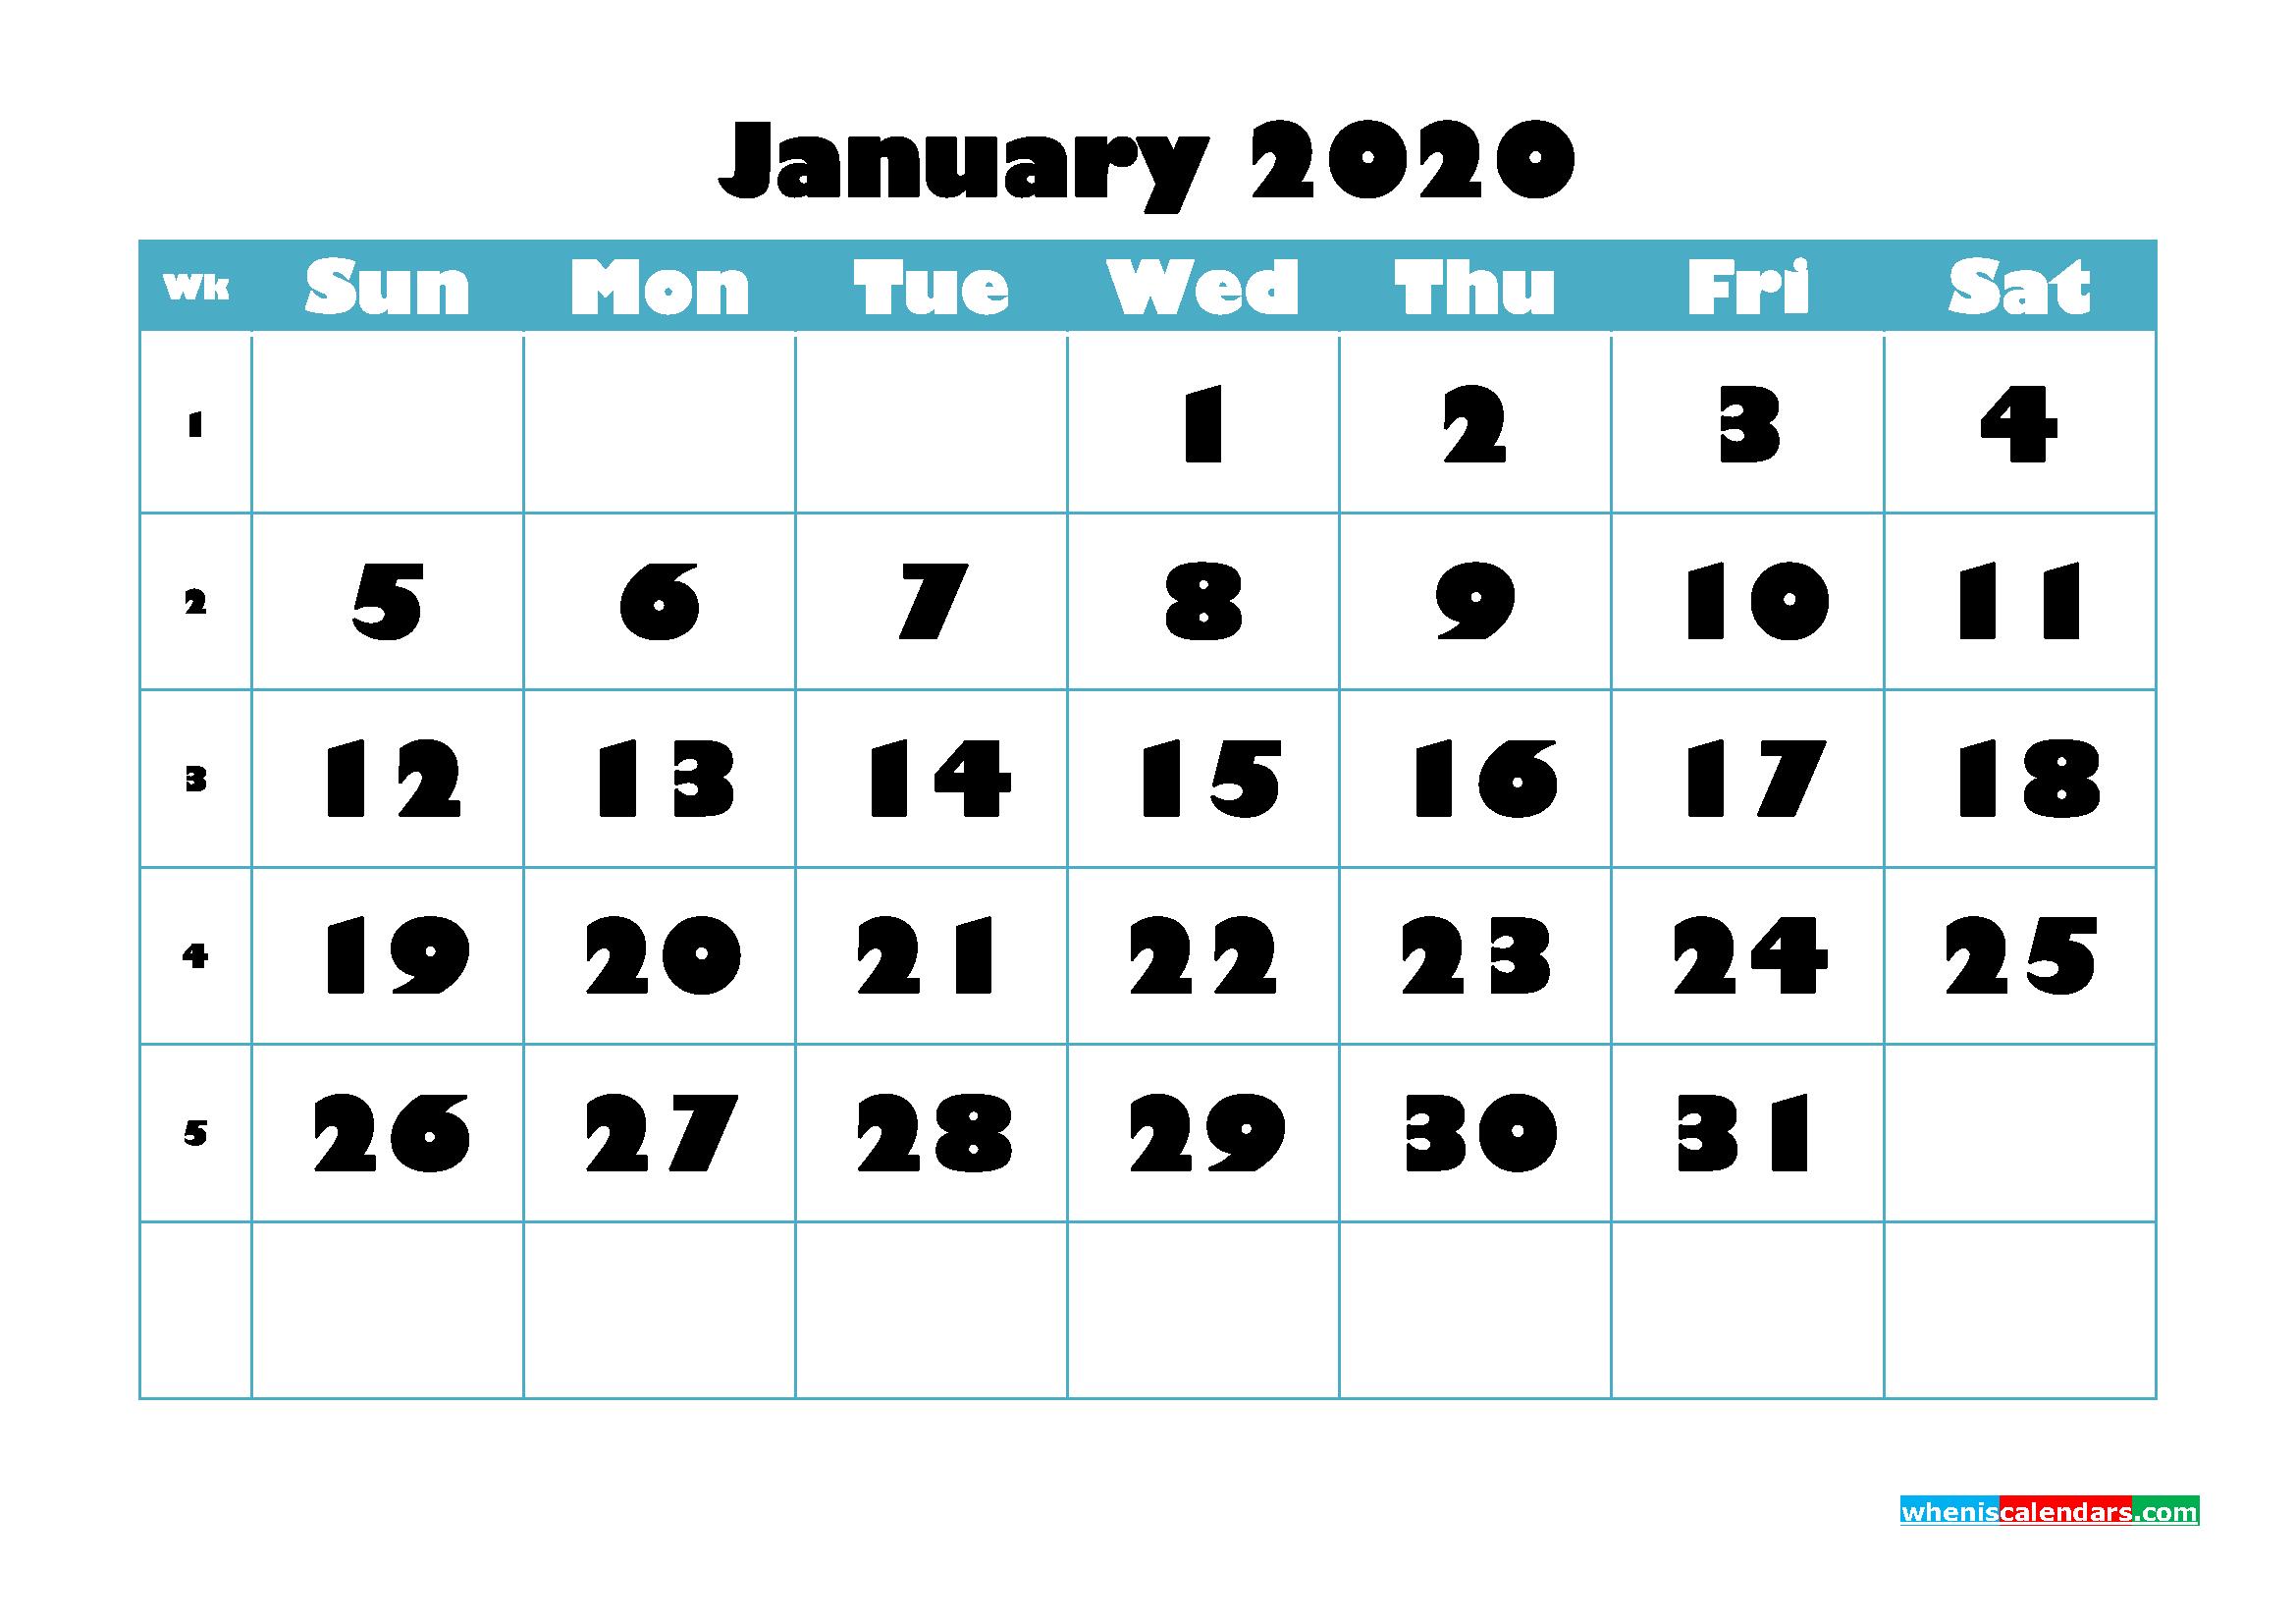 Free Blank Calendar January 2020 Printable - No.m20b757